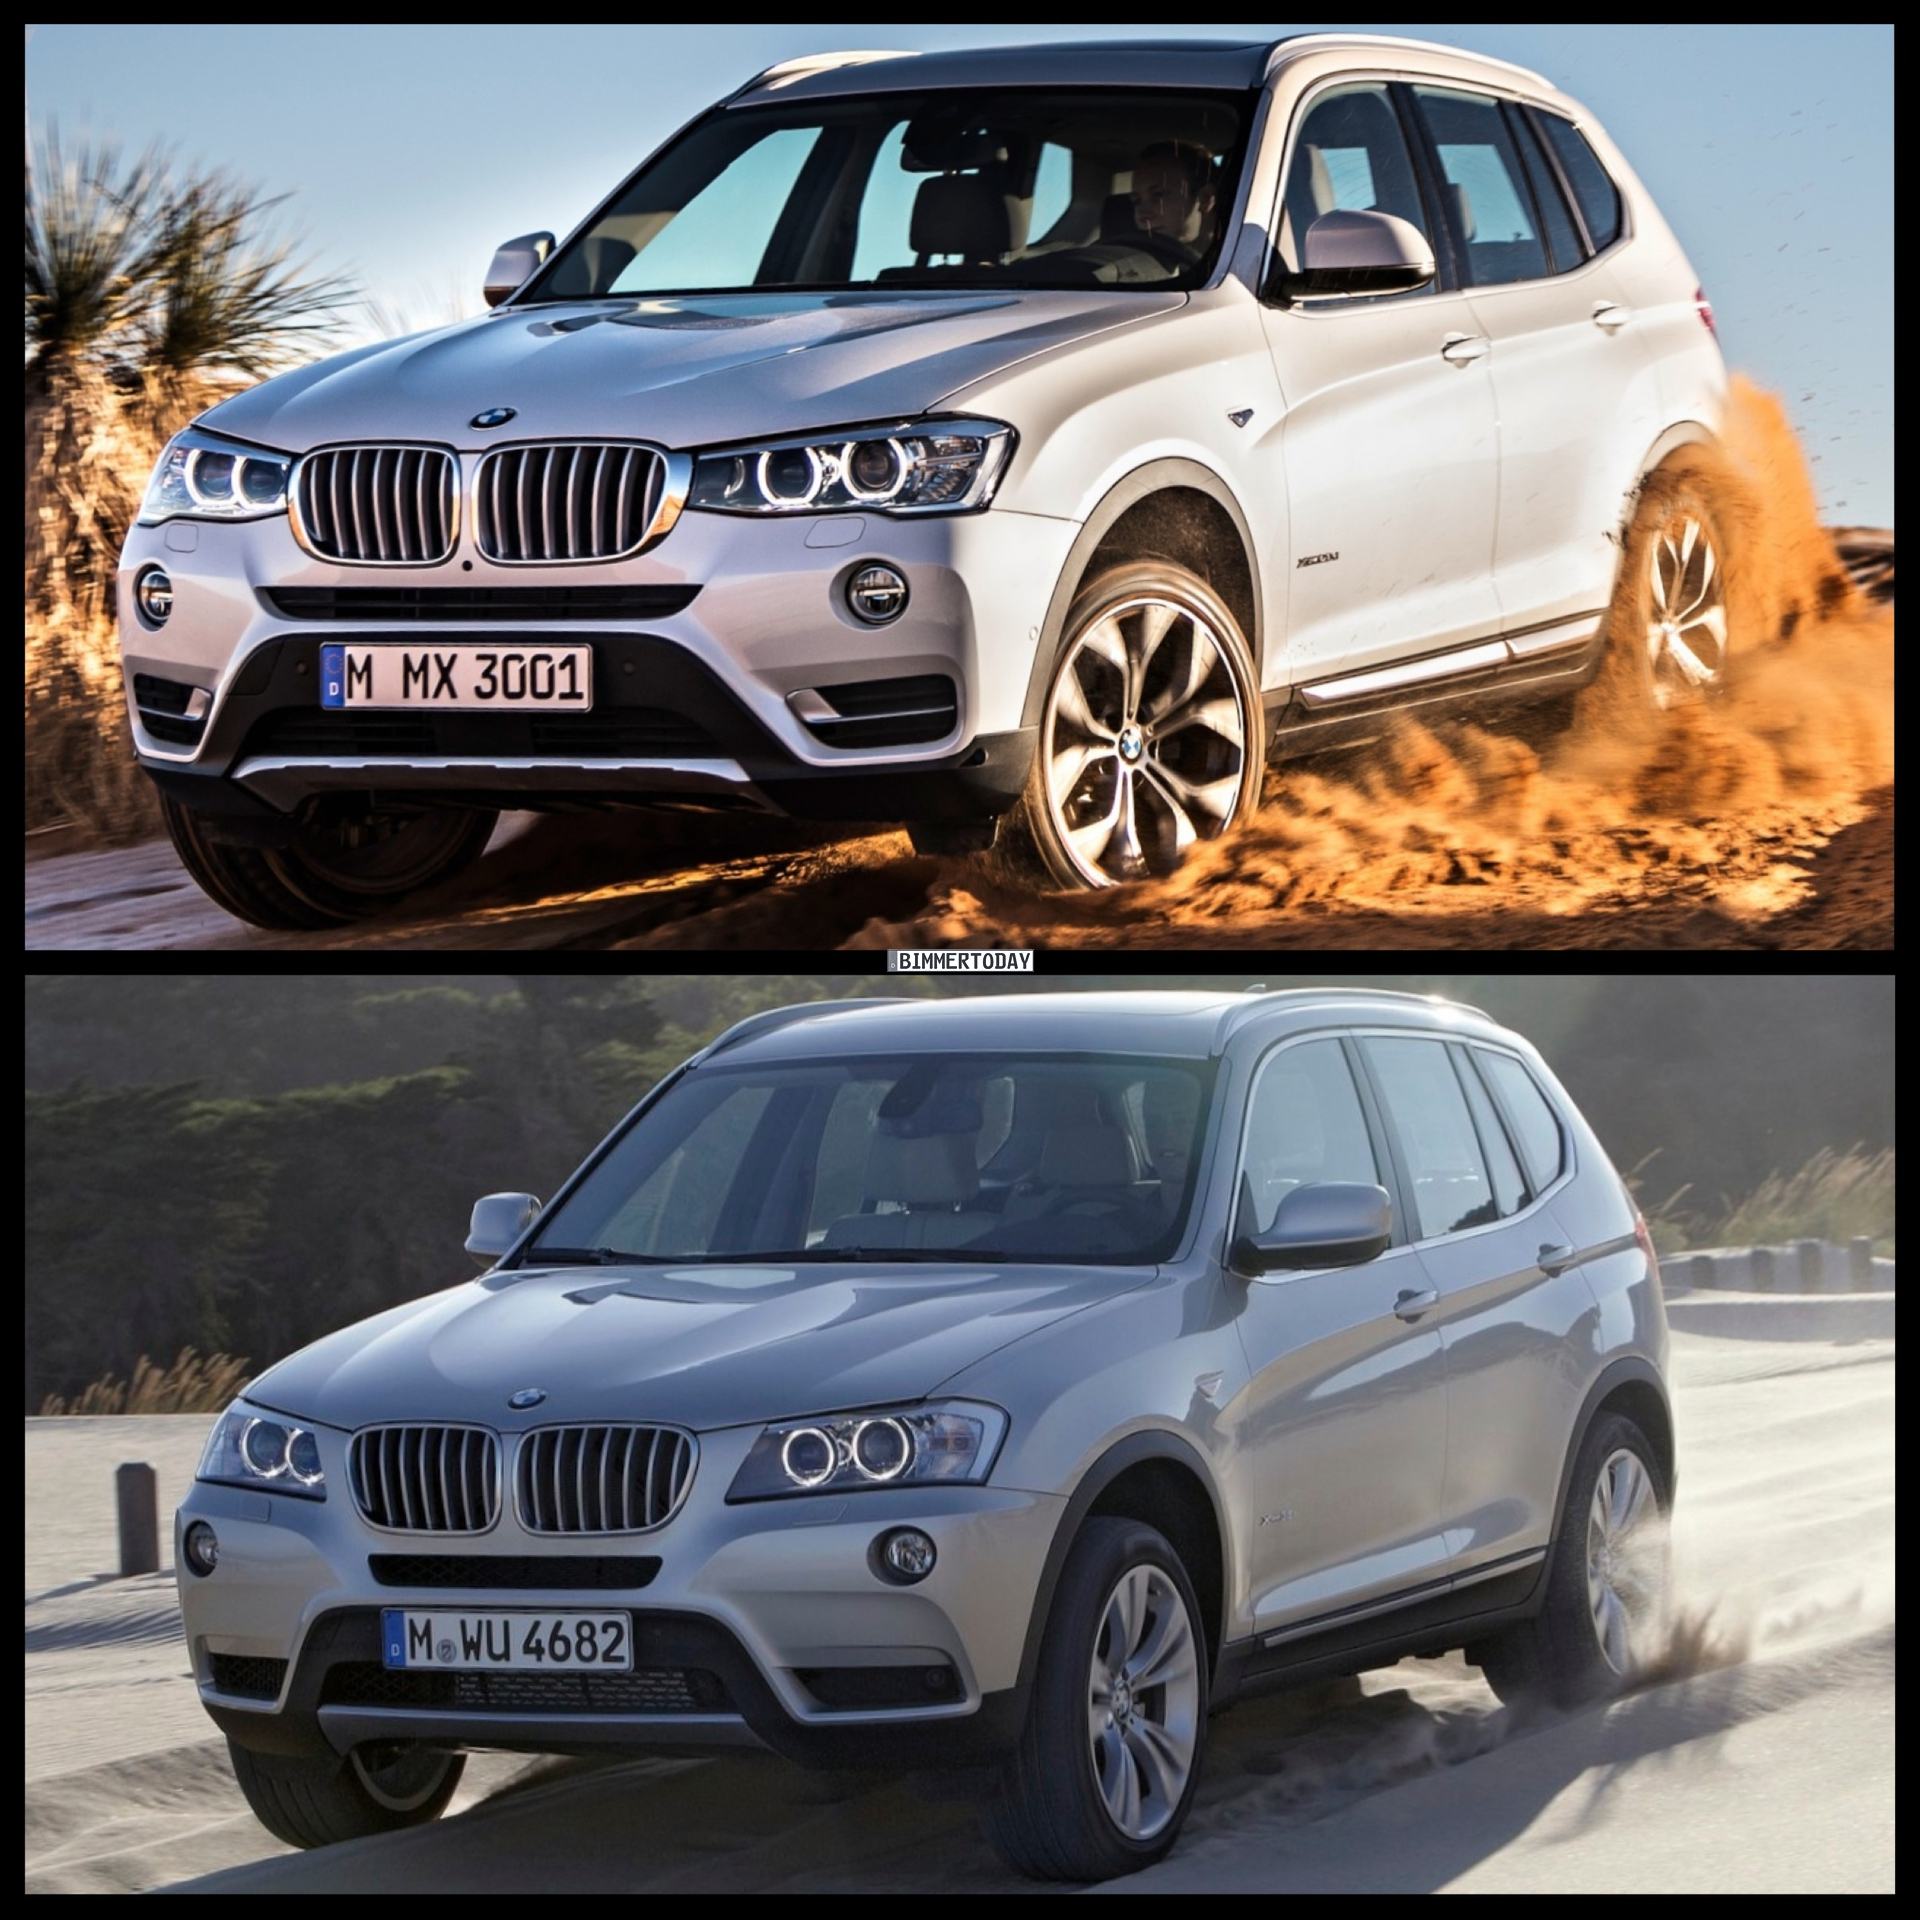 Bild Vergleich Bmw X3 Facelift 2014 F25 Lci Trifft Pre Facelift